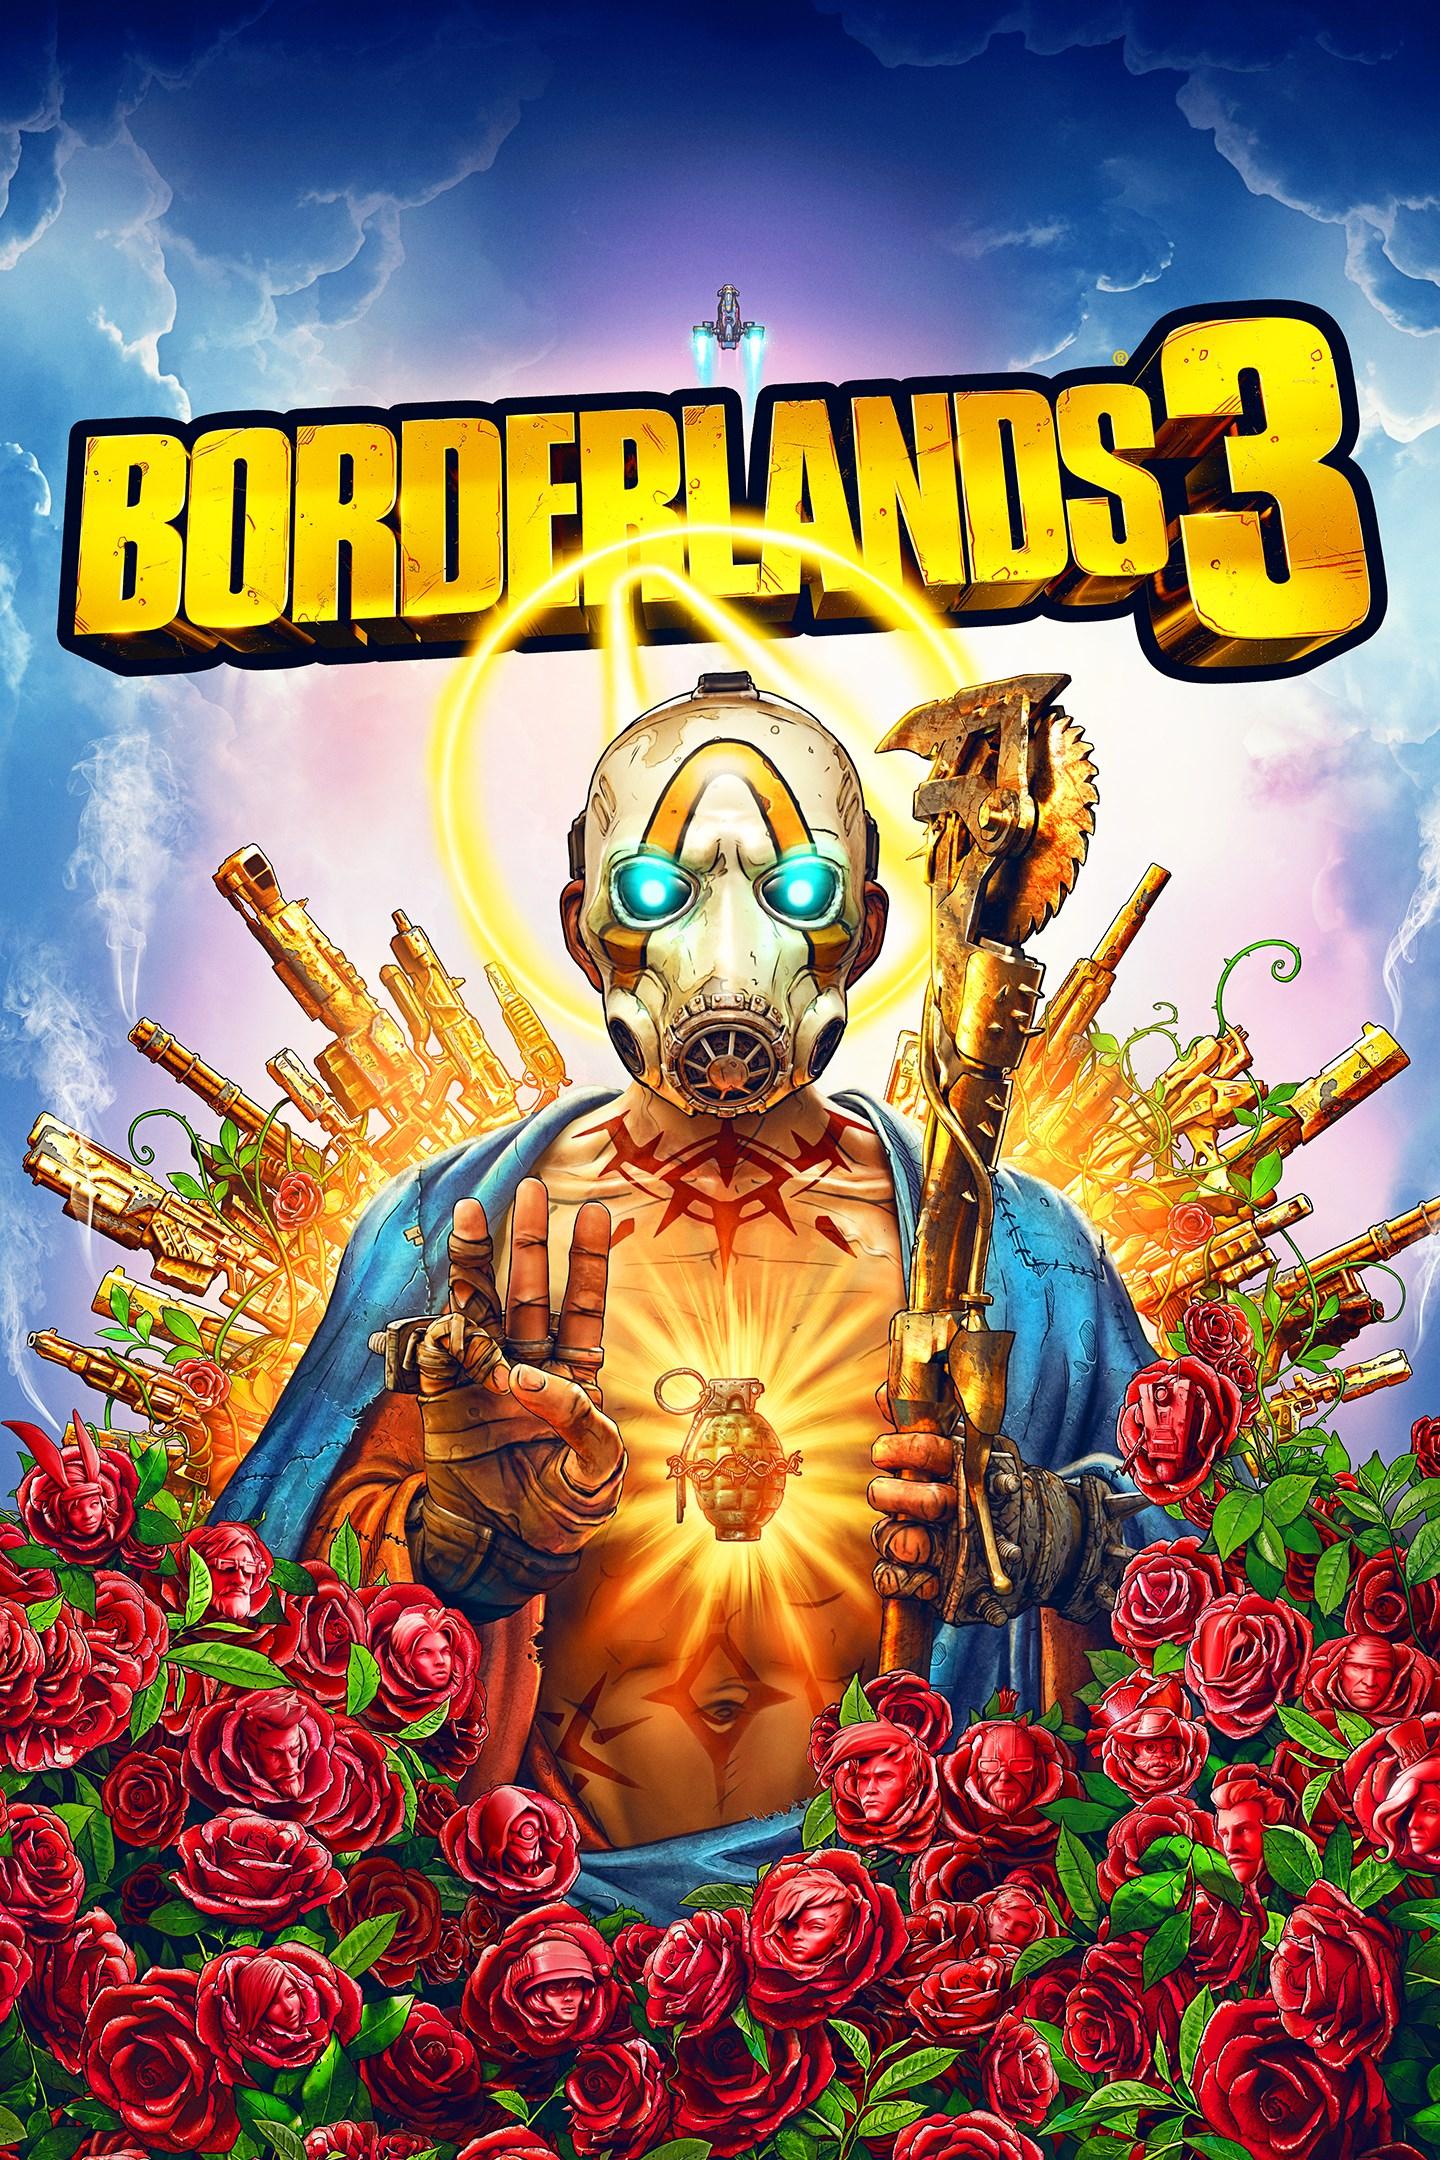 XBOX ONE, PS4, PC: 5 GOLDEN KEYS (GRATIS) para Borderlands 3